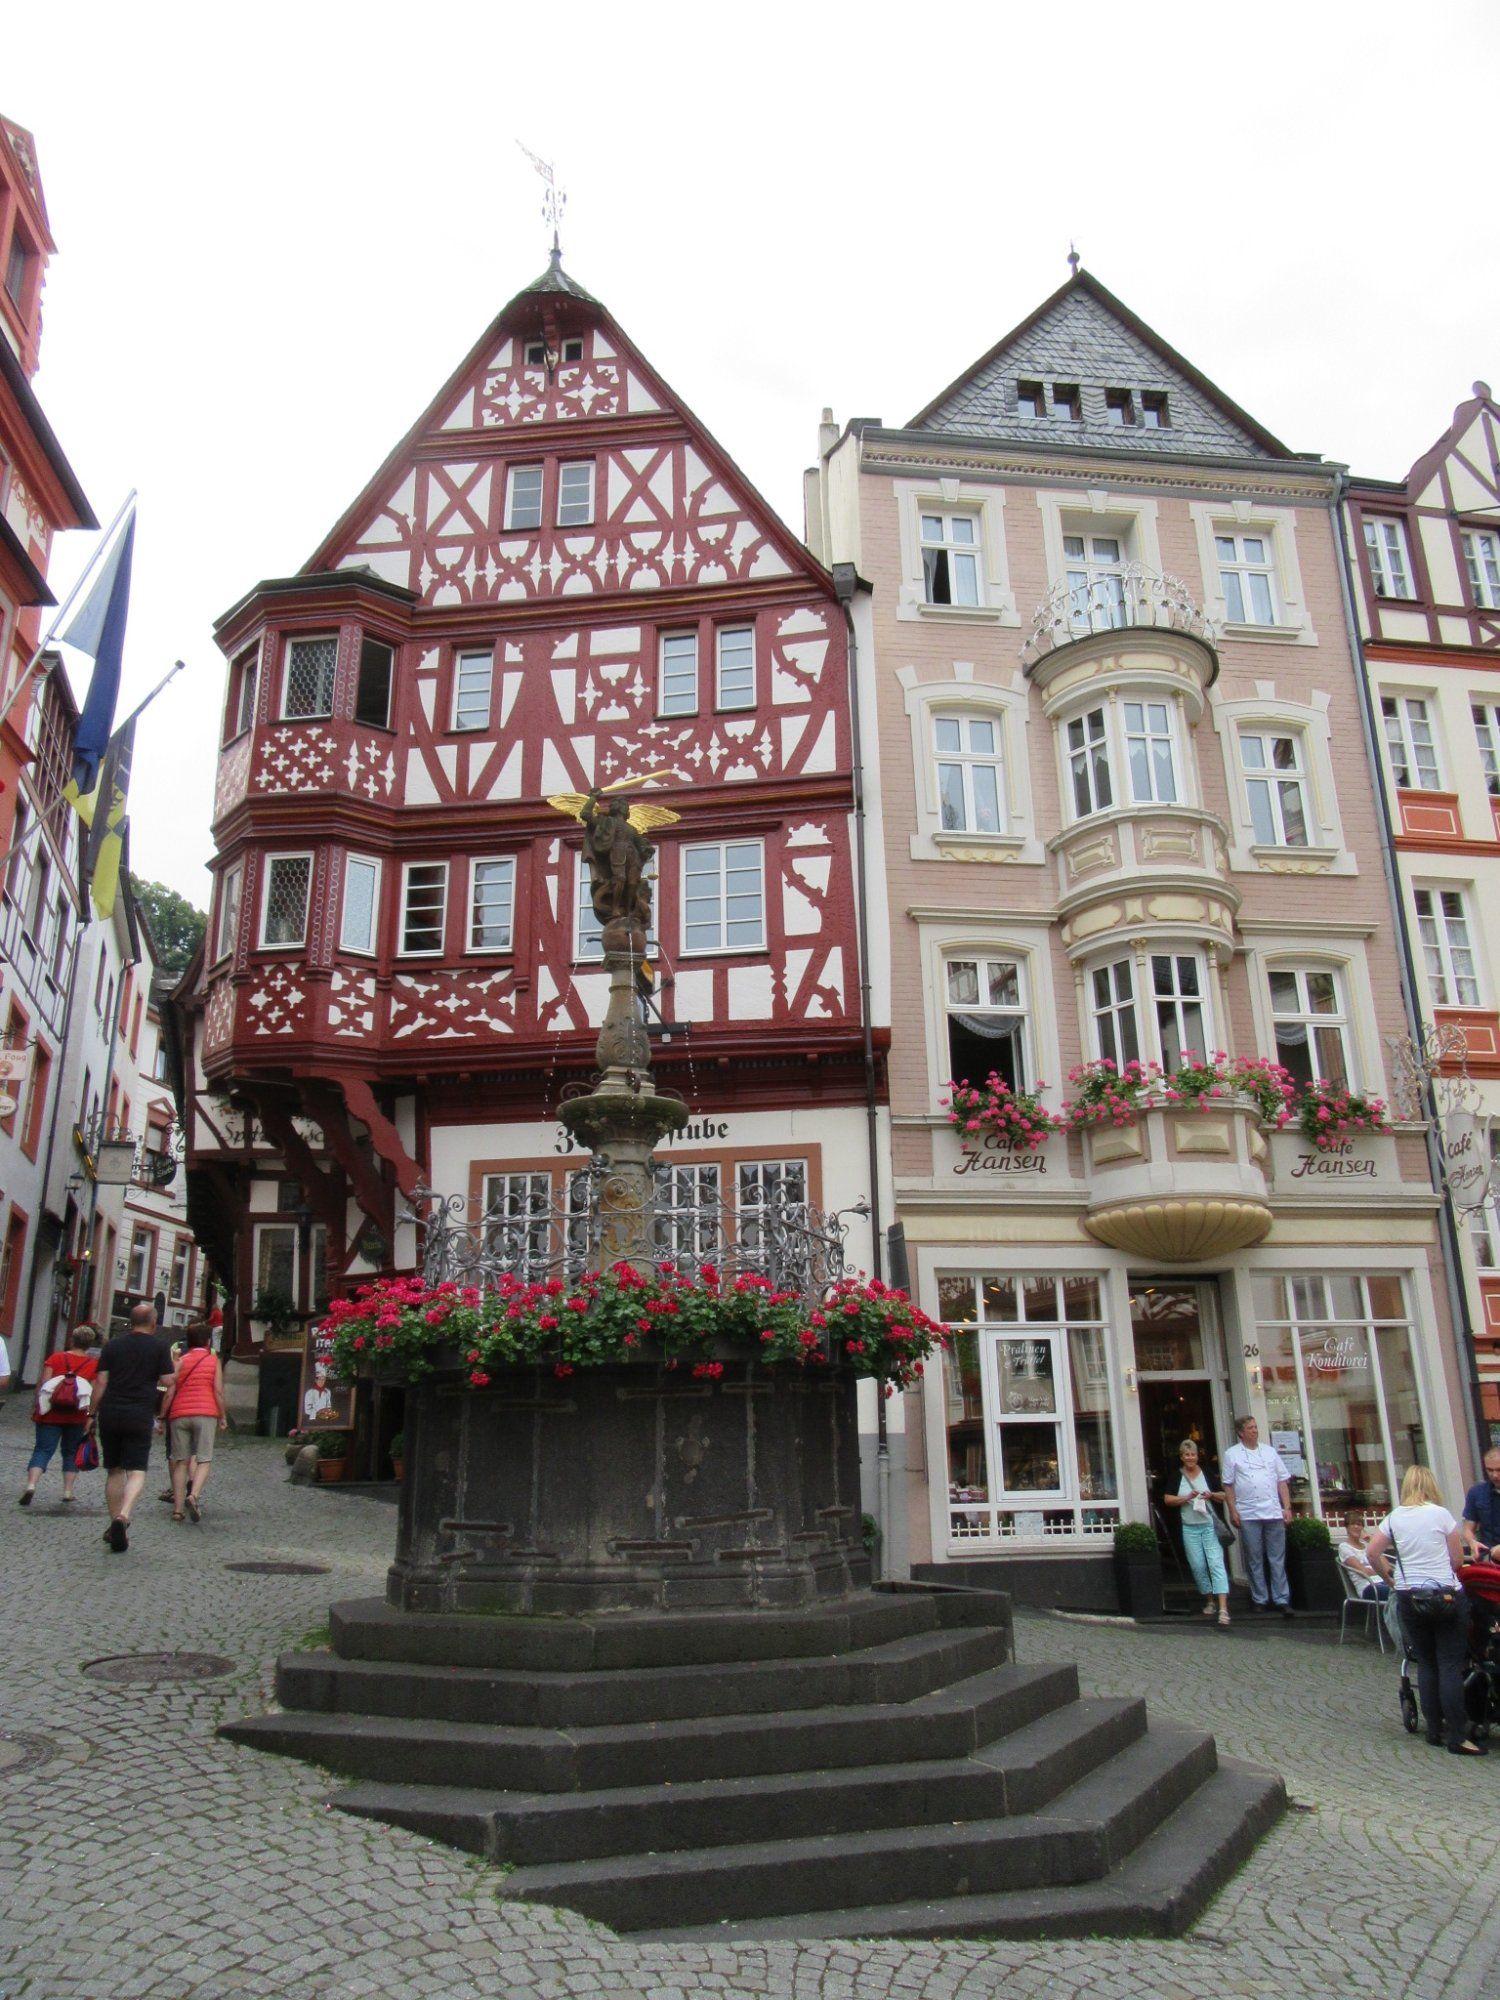 Mittelalterlicher Marktplatz Bernkastel Kues Germany Top Tips Before You Go Bernkastel Kues Trip Advisor House Styles